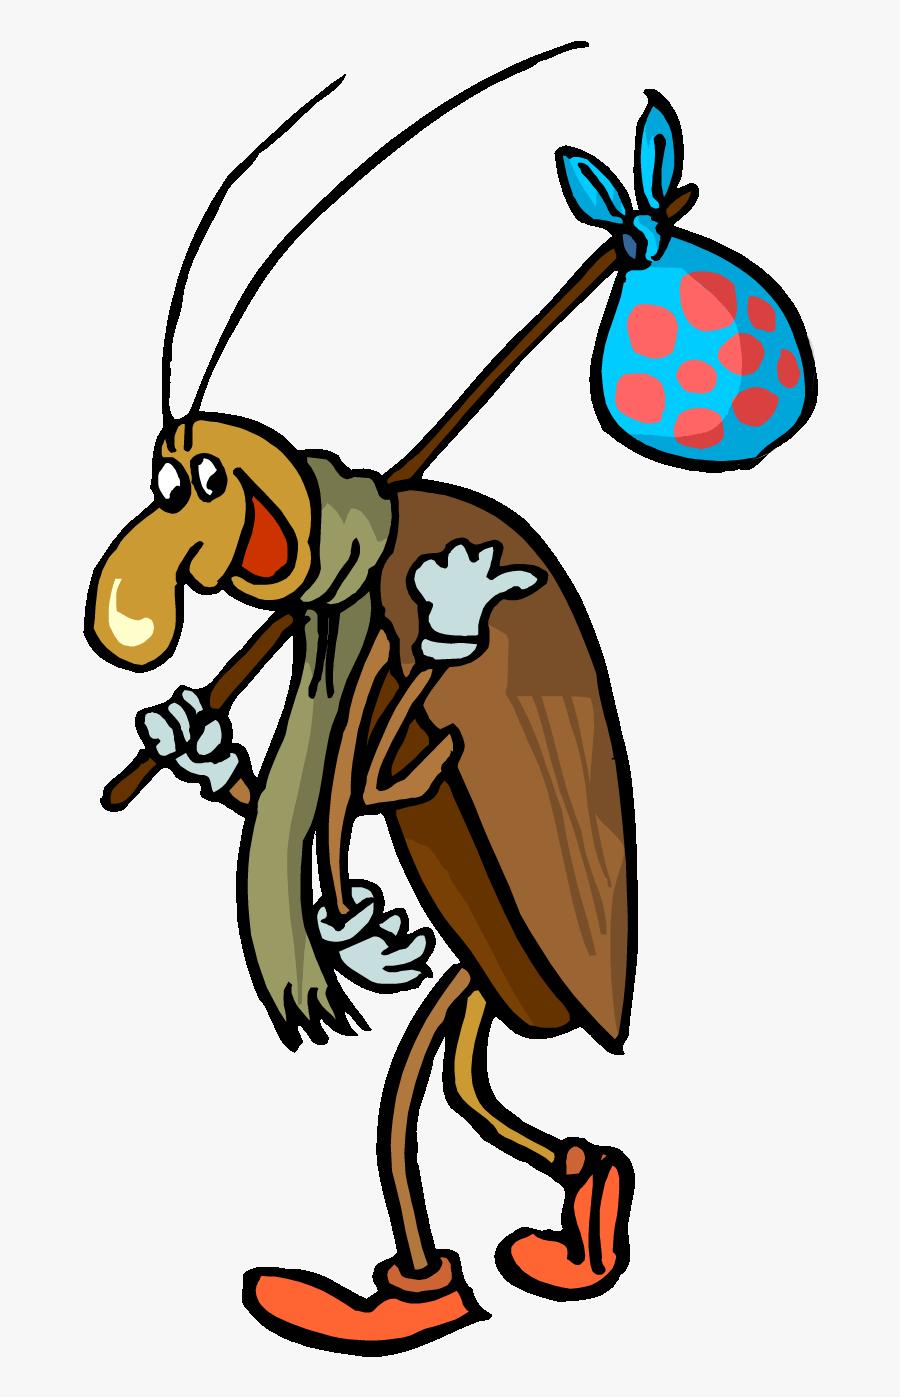 Little Buggers Pest Control Clipart , Png Download - Little Buggers, Transparent Clipart